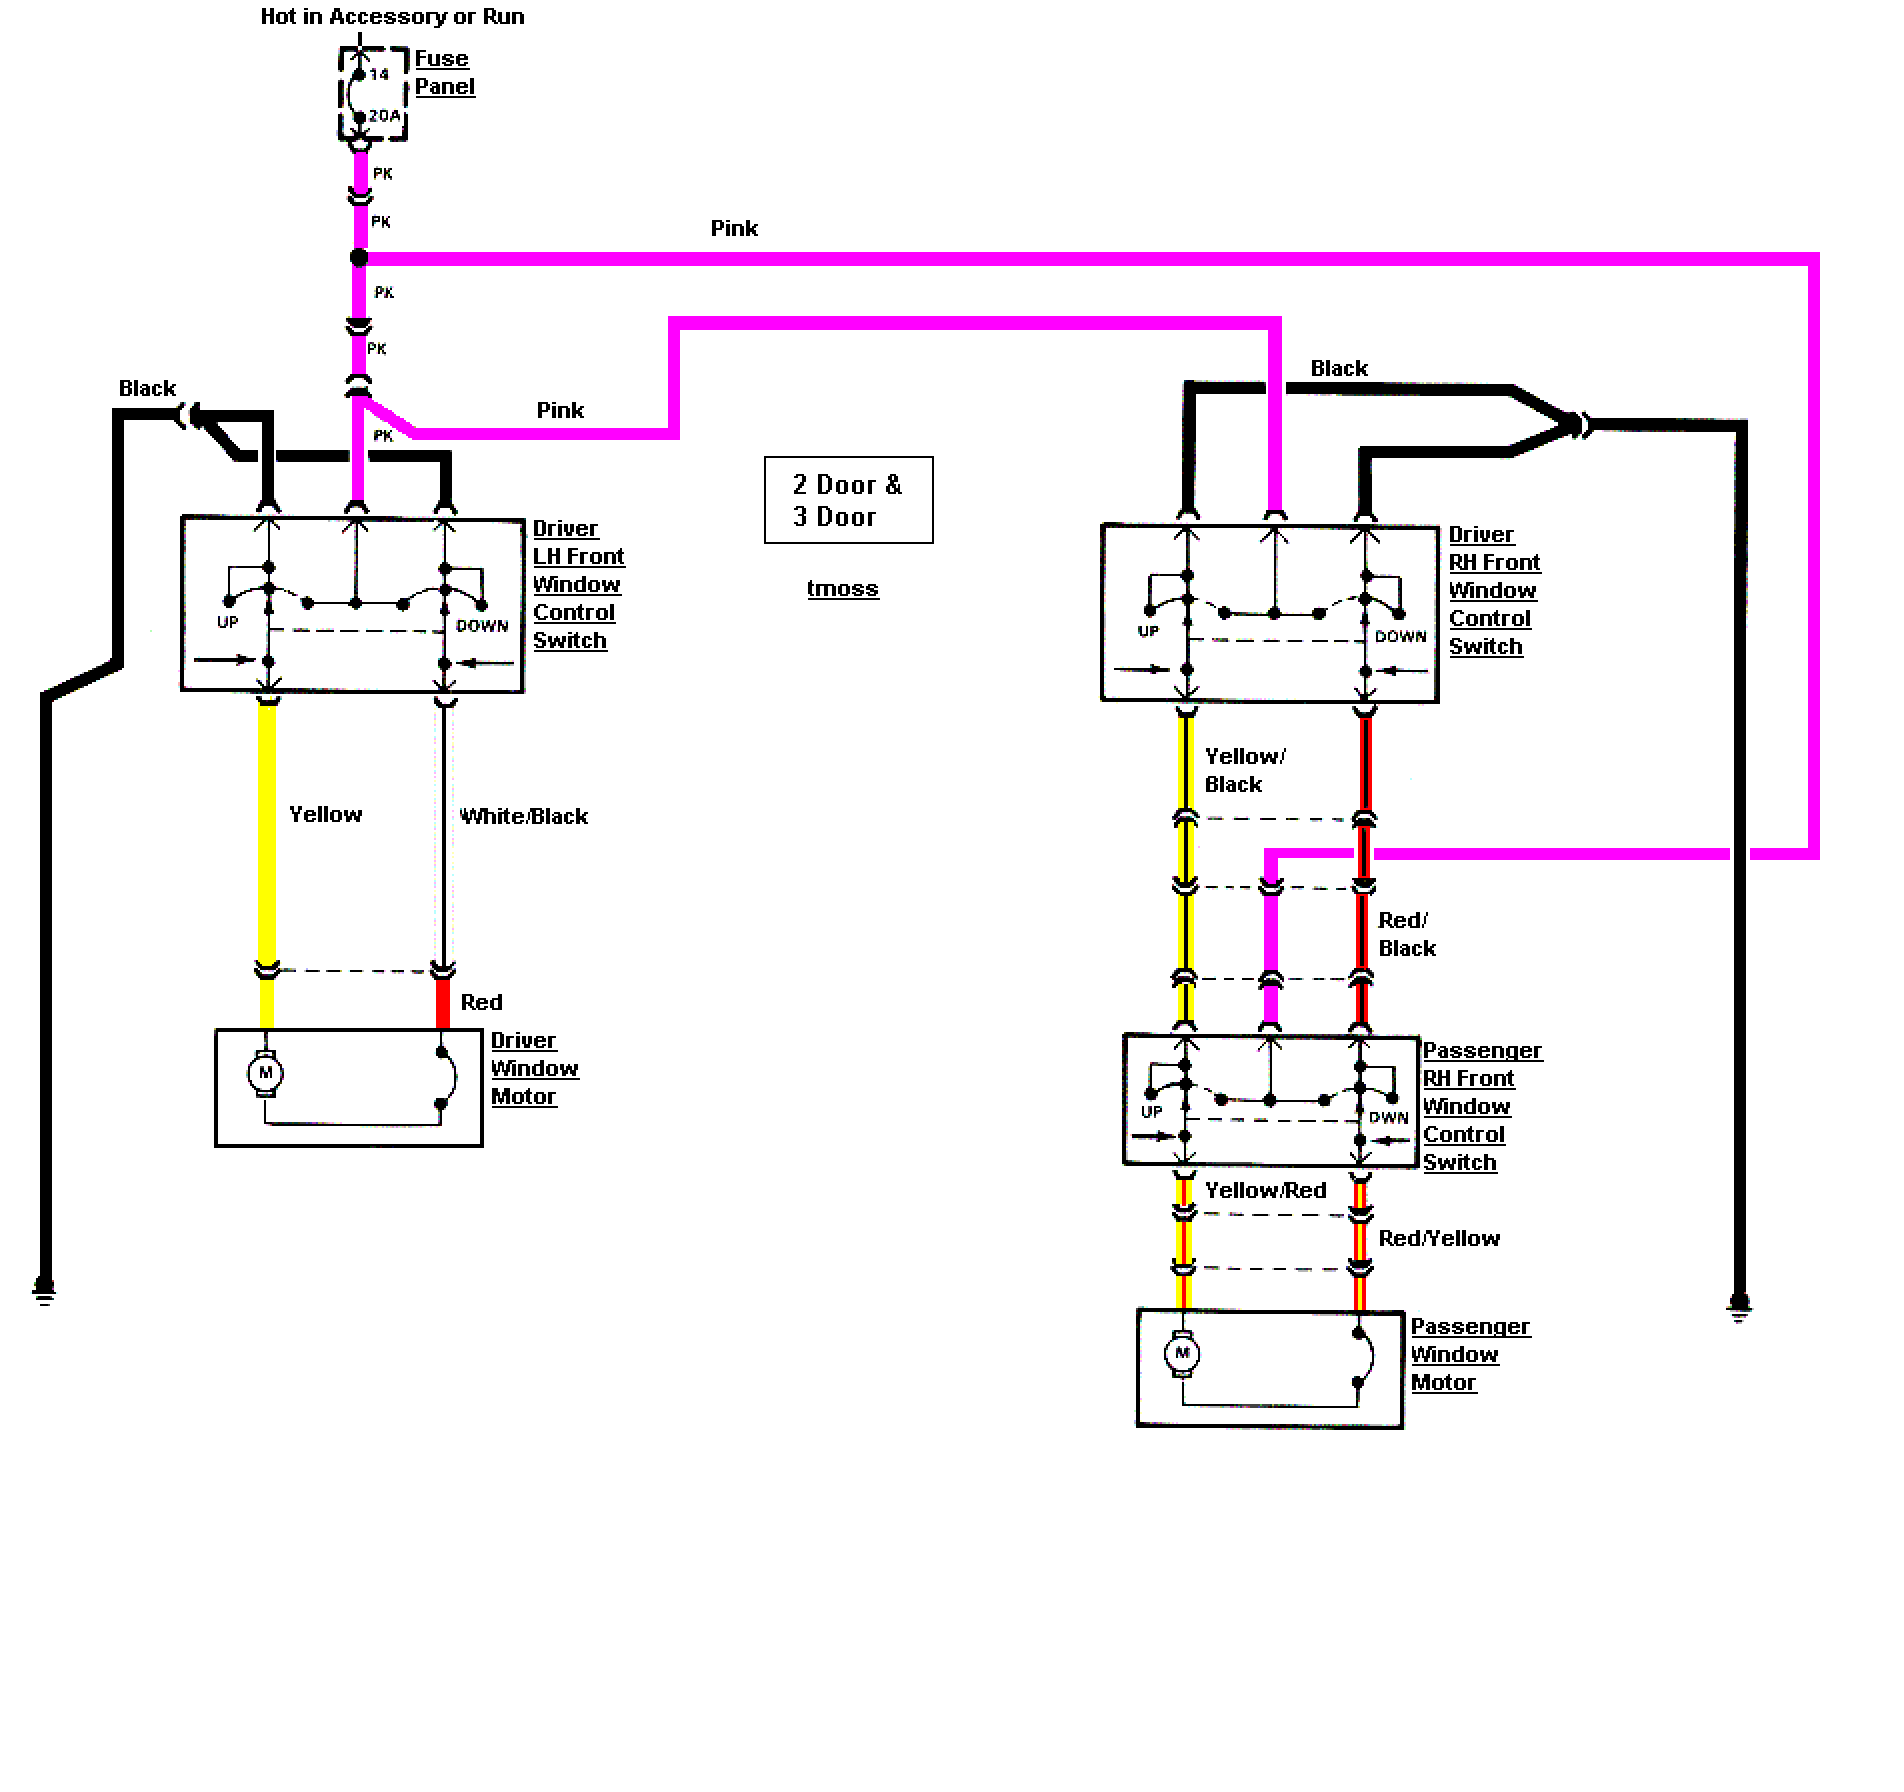 Surprising Gm Window Switch Wiring Wiring Diagram Panel Wiring Cloud Ittabpendurdonanfuldomelitekicepsianuembamohammedshrineorg